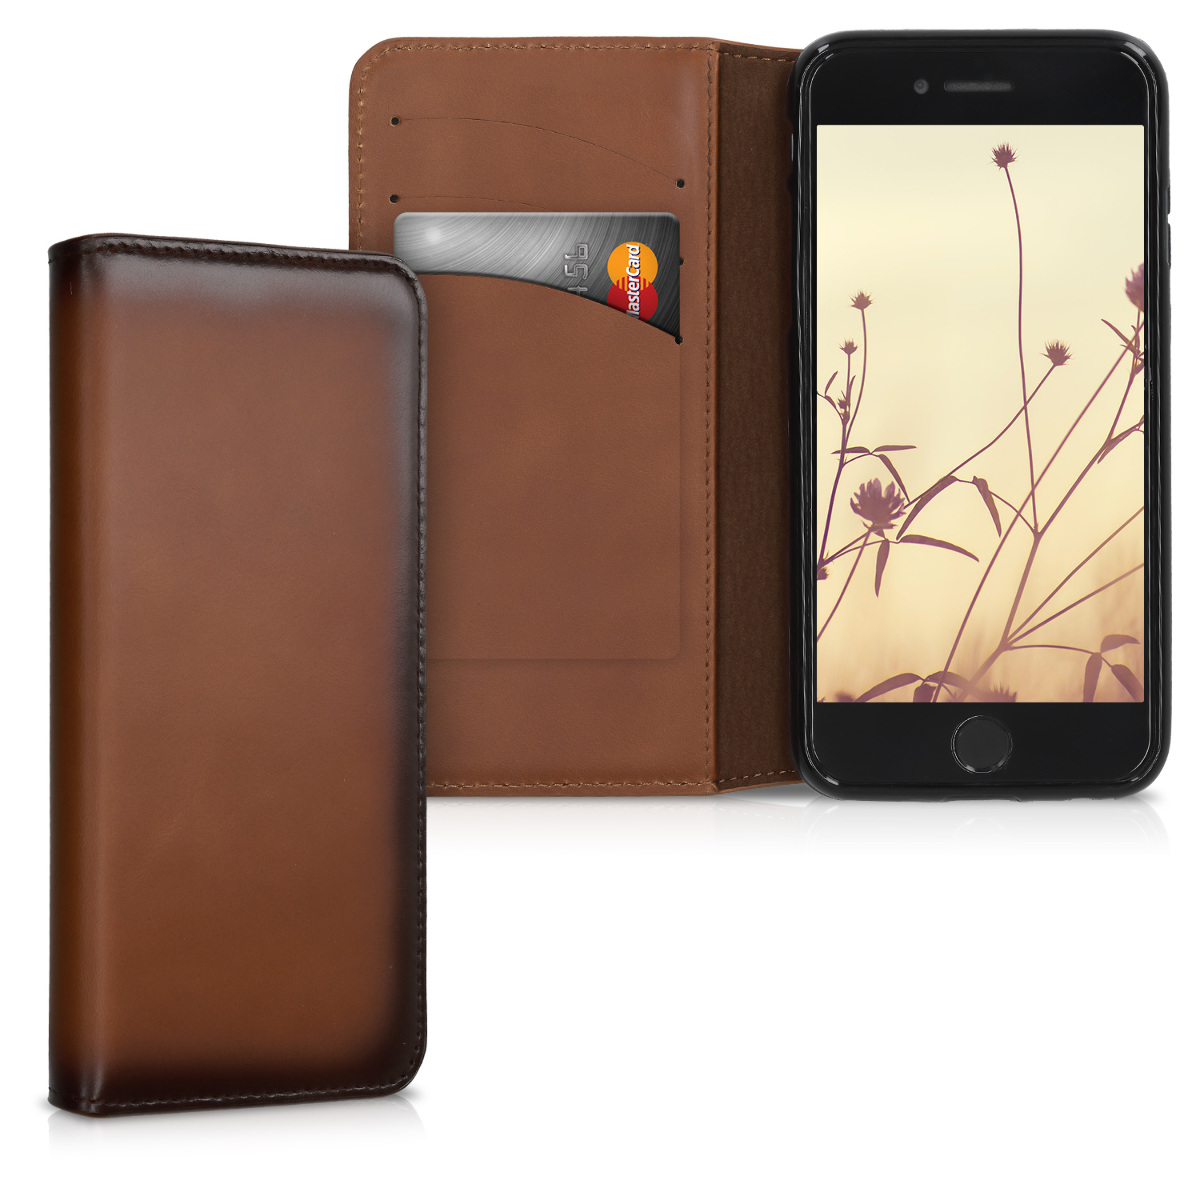 Kalibri Δερμάτινη Θήκη - Πορτοφόλι iPhone 7 / 8 - Vintage Brown (39401.133)